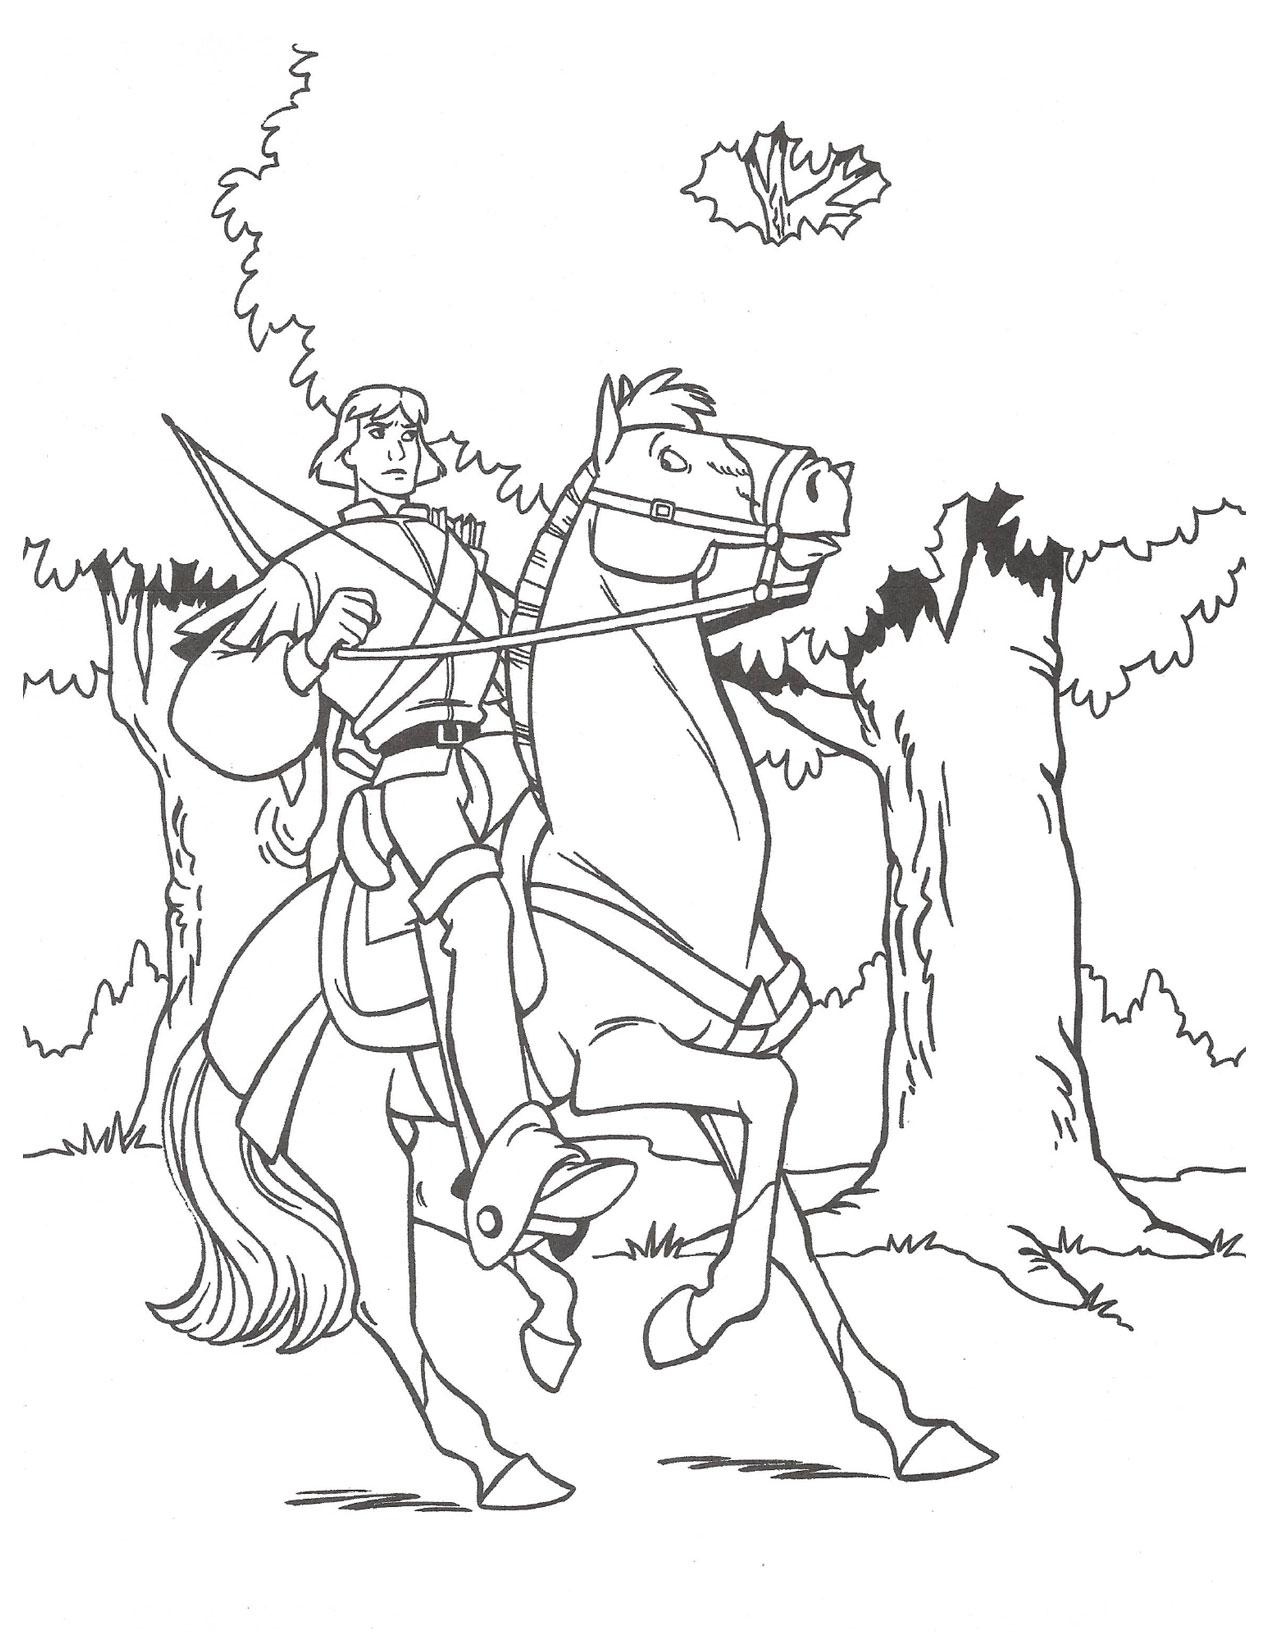 Swan Princess official coloring page 8.png | Princess coloring ... | 1650x1275